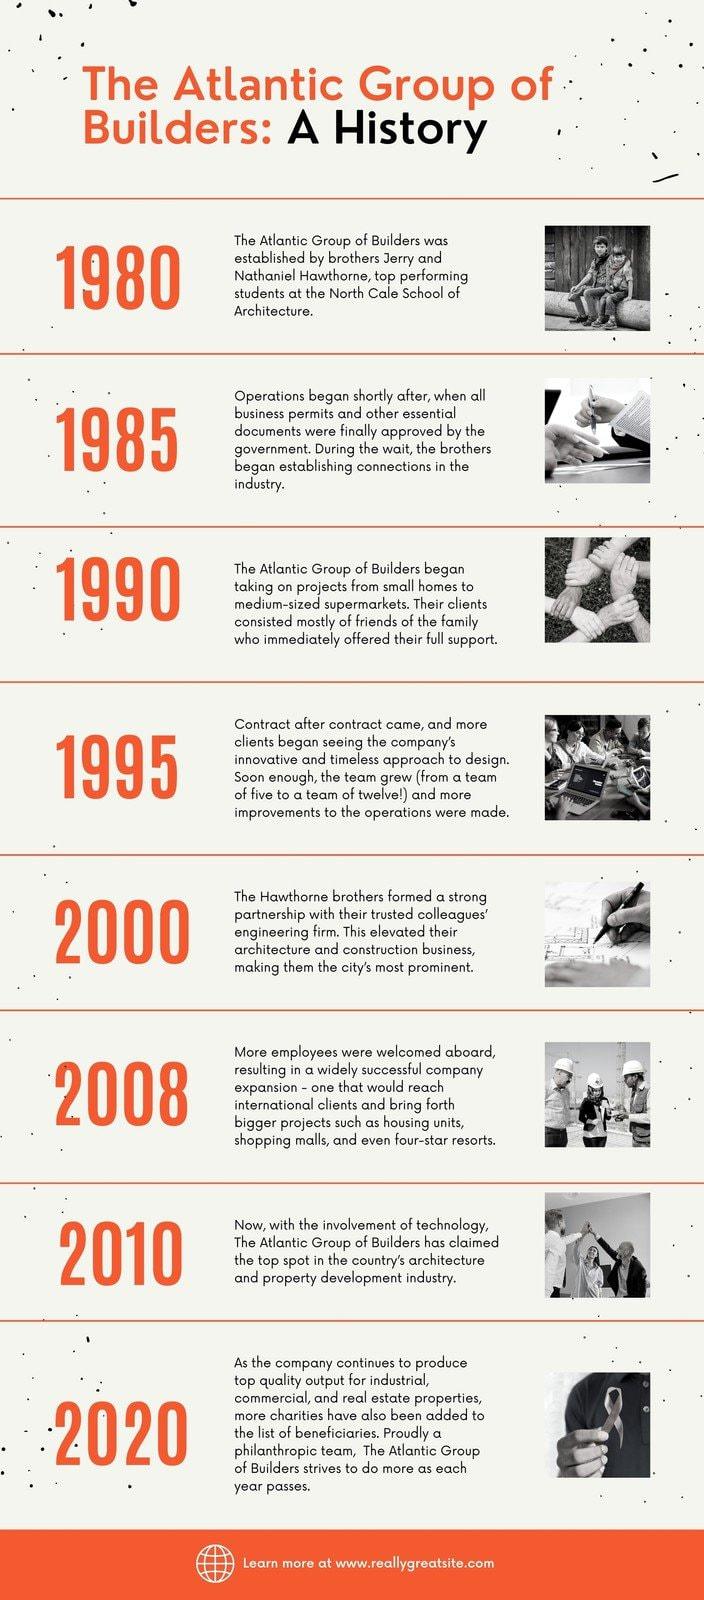 Orange Photo Clean & Corporate Organization History Timeline Infographic